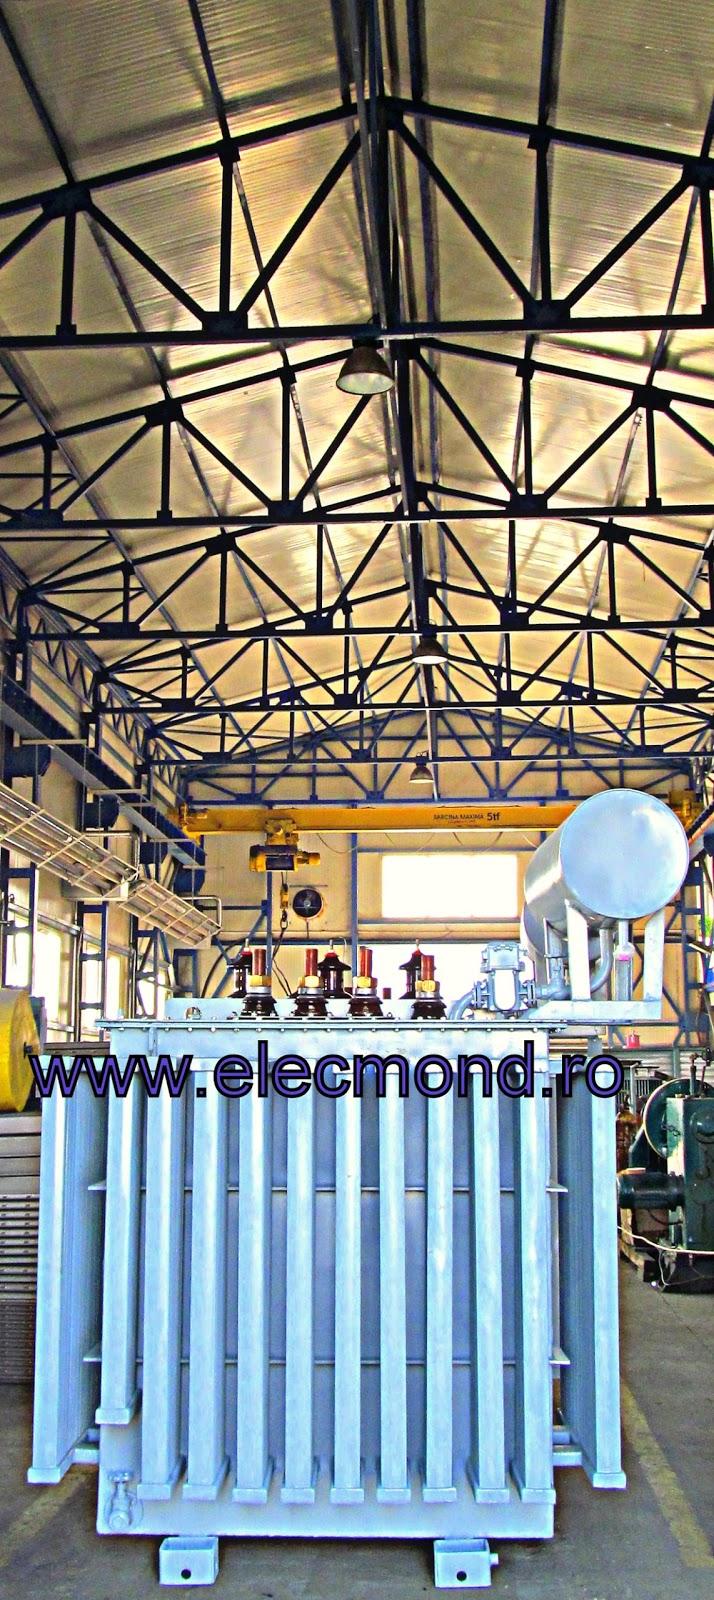 transformatoare 1600 , transformatoare 1600 kVA pret , transformator 1600 kVA , transformatoare de putere , transformator de putere , elecmond , transformatoare electrice , elecmond  ,